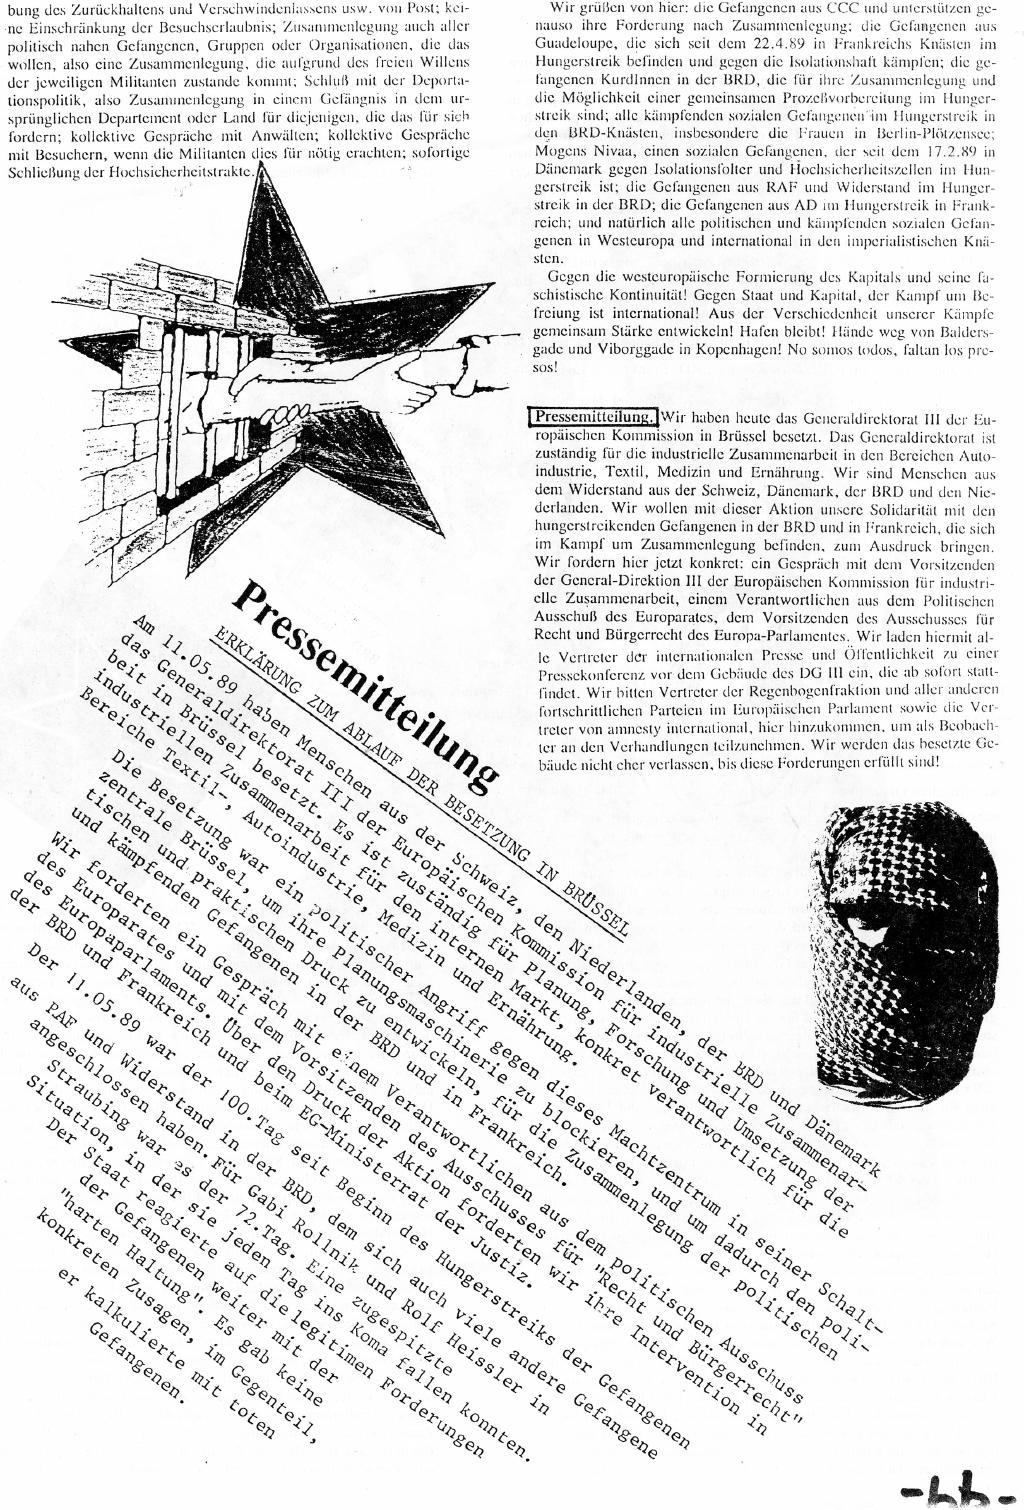 Belgien_Doku_Besetzung_EG_Kommission_1989_068